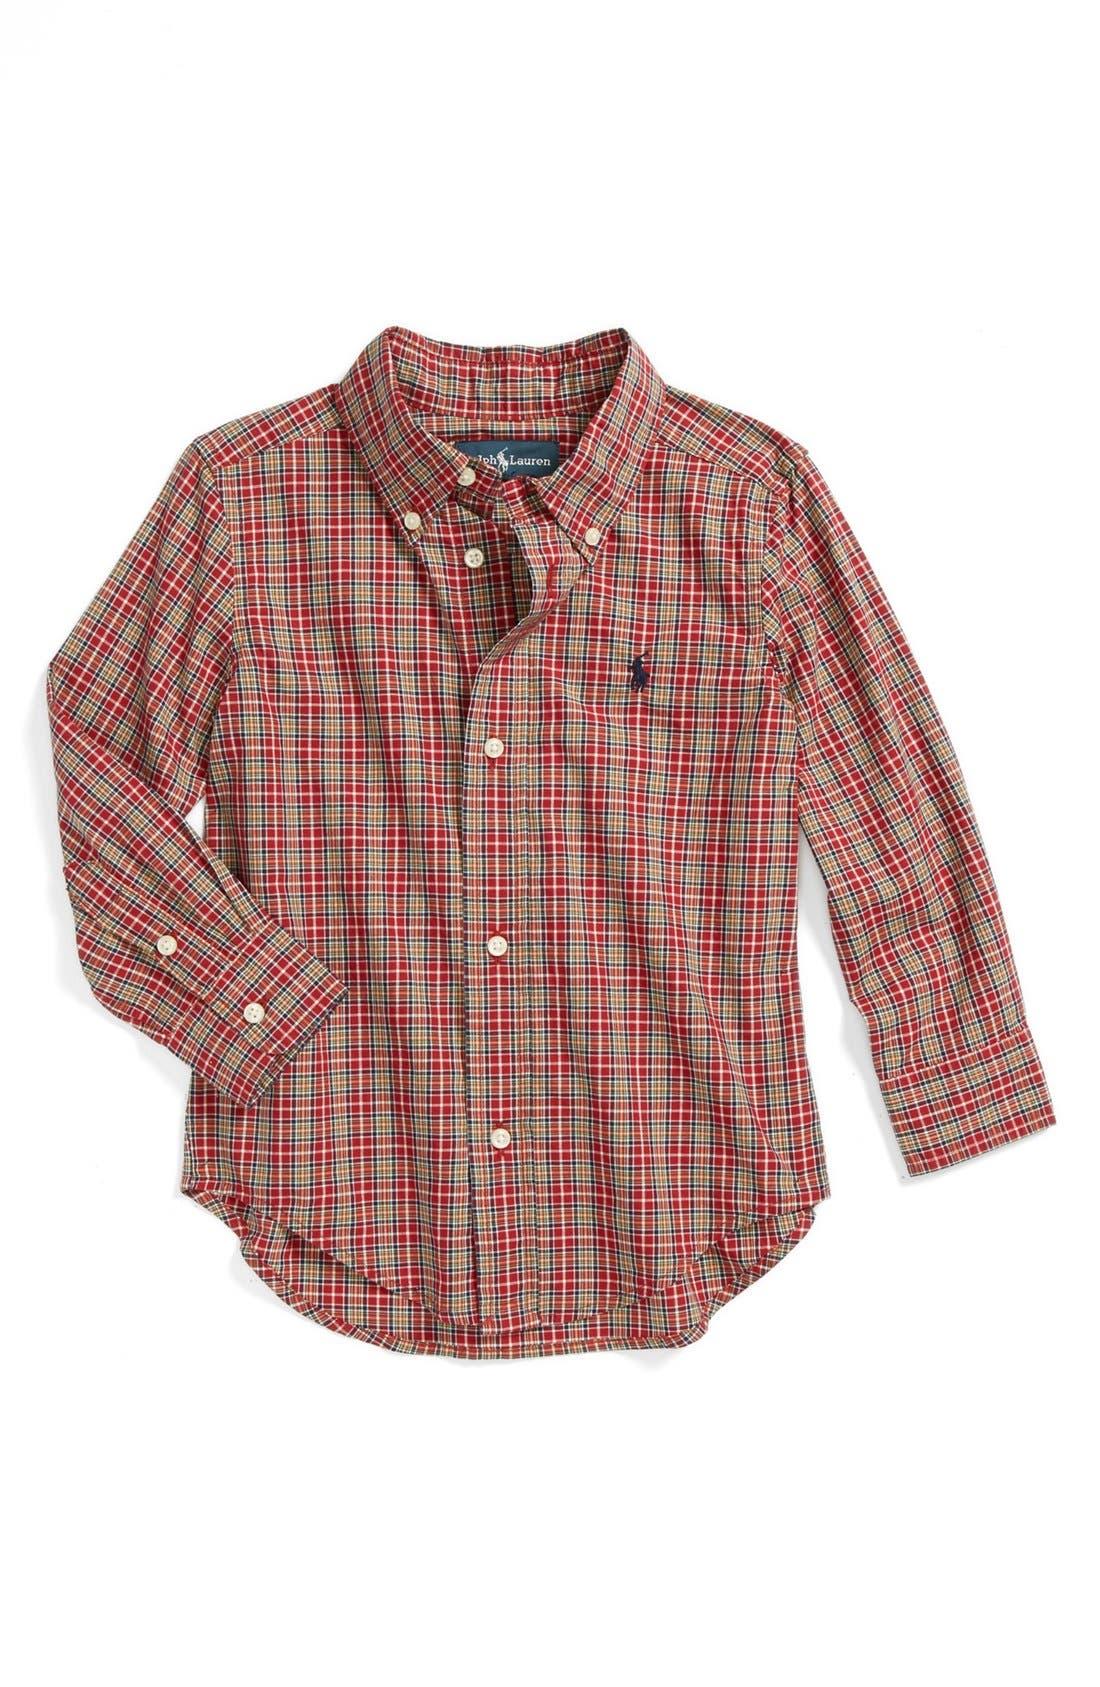 Alternate Image 1 Selected - Ralph Lauren 'Blake' Sport Shirt (Toddler Boys)